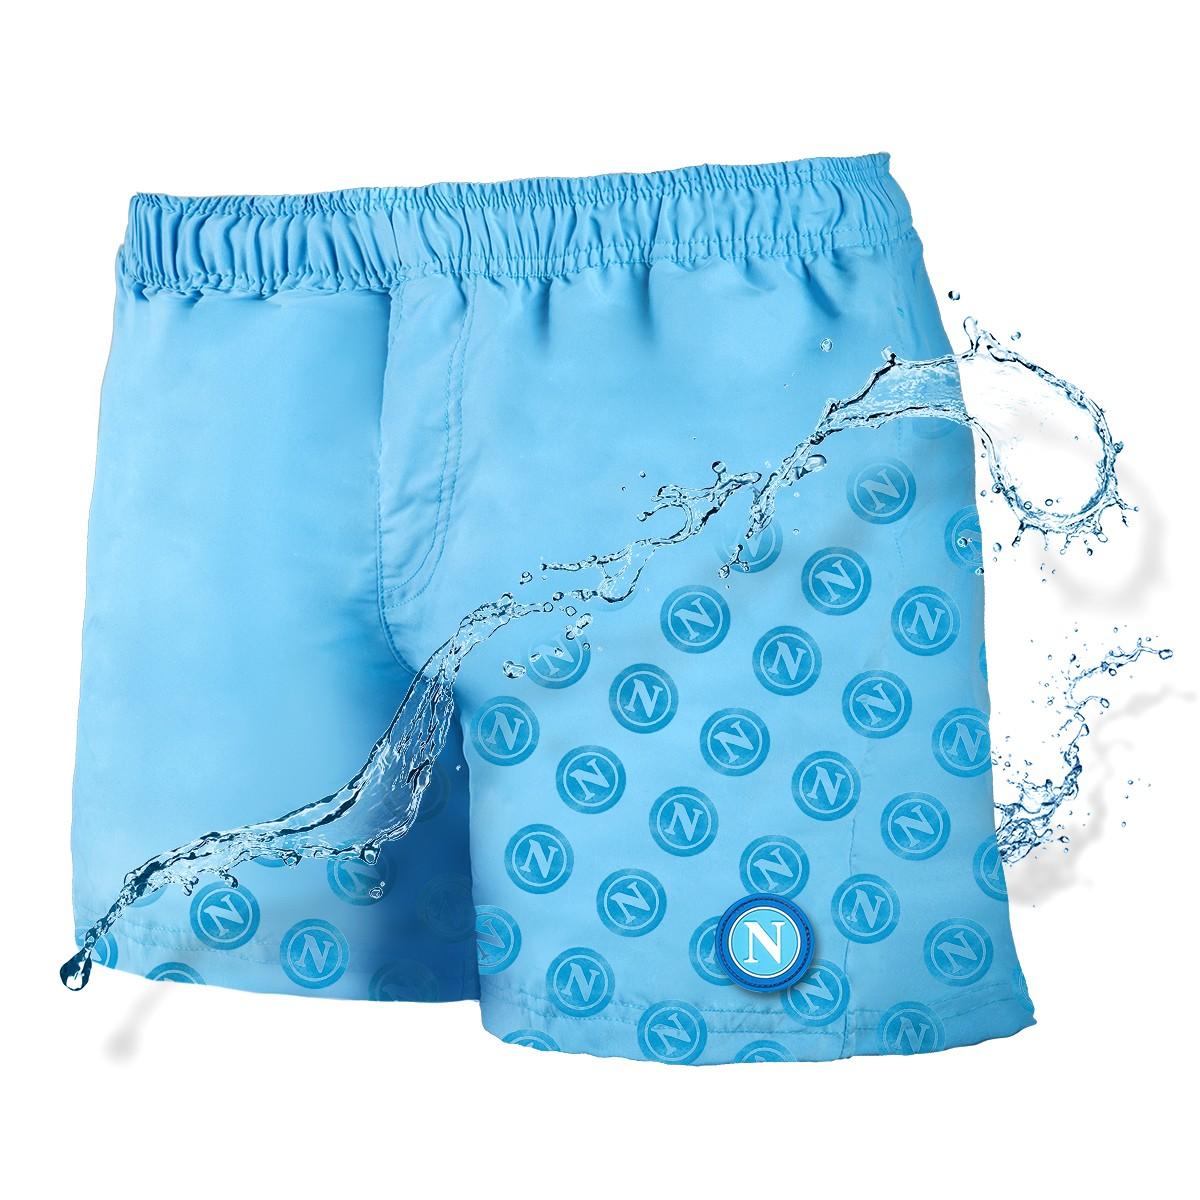 Sscn sky blue magic print logo swimming trunks